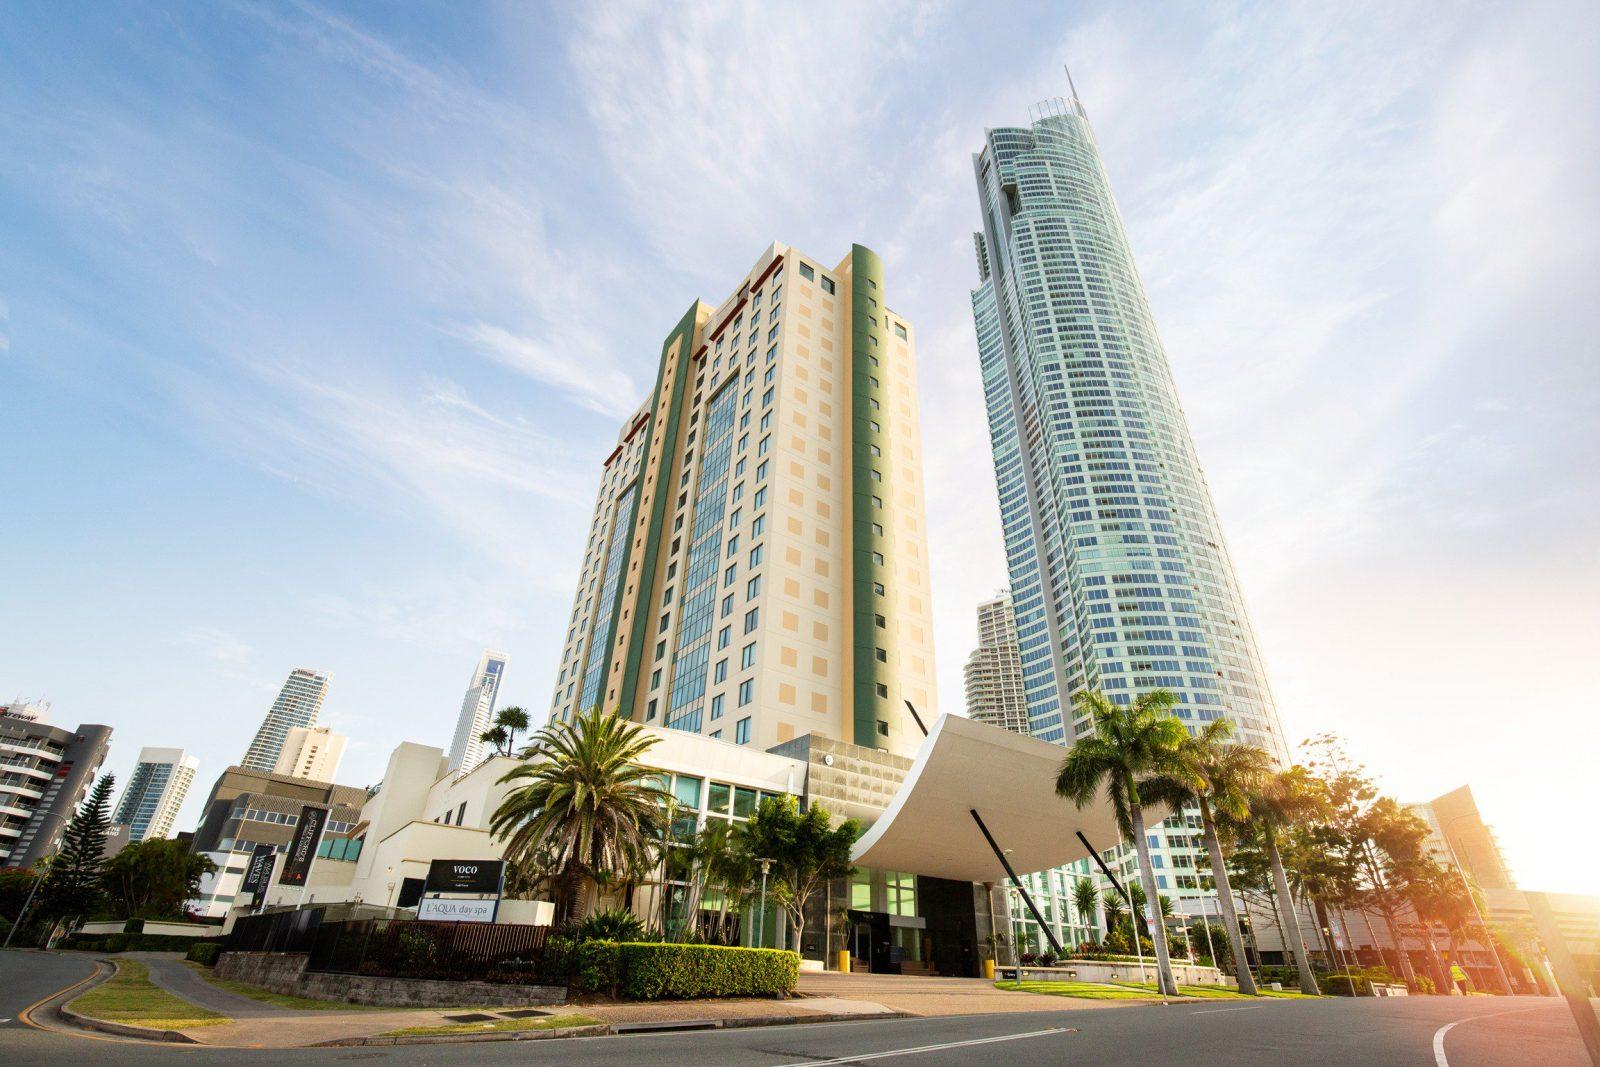 voco Gold Coast hotel exterior